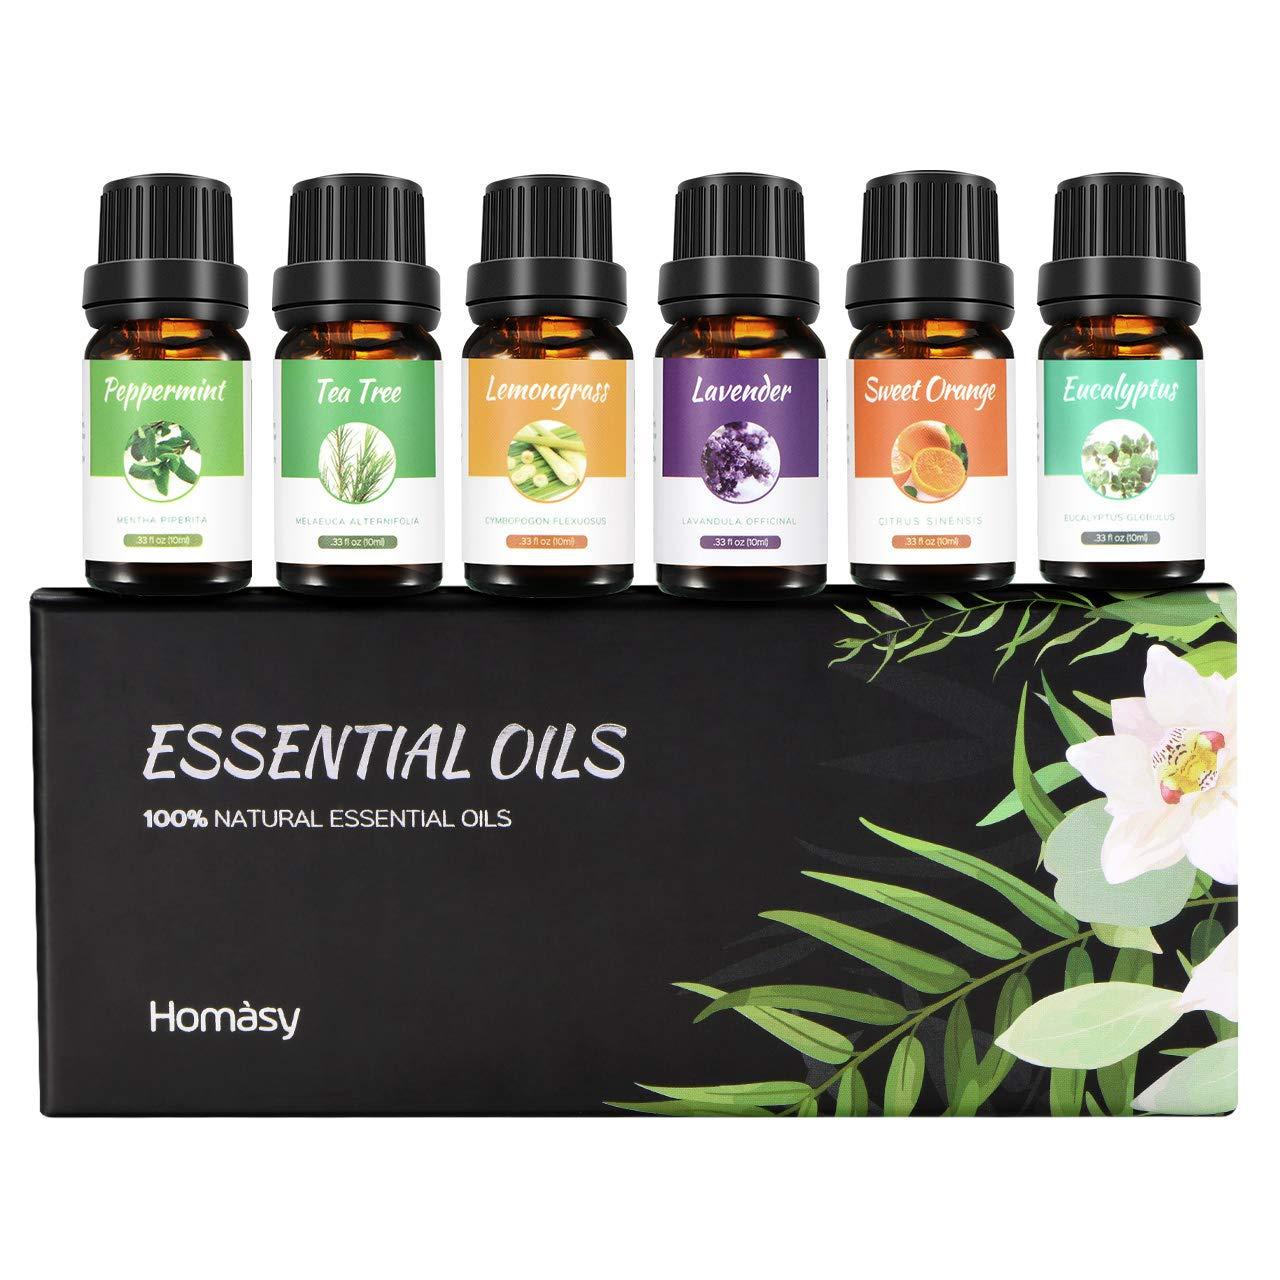 Homasy Aromatherapy Essential Oil Set, 100% Pure Essential Oils Gift Set, Top 6 Natural Essential Fragrance Oil Set for Diffuser, 10ML(Tea Tree, Peppermint, Lavender, Eucalyptus, Lemon Grass, Orange)